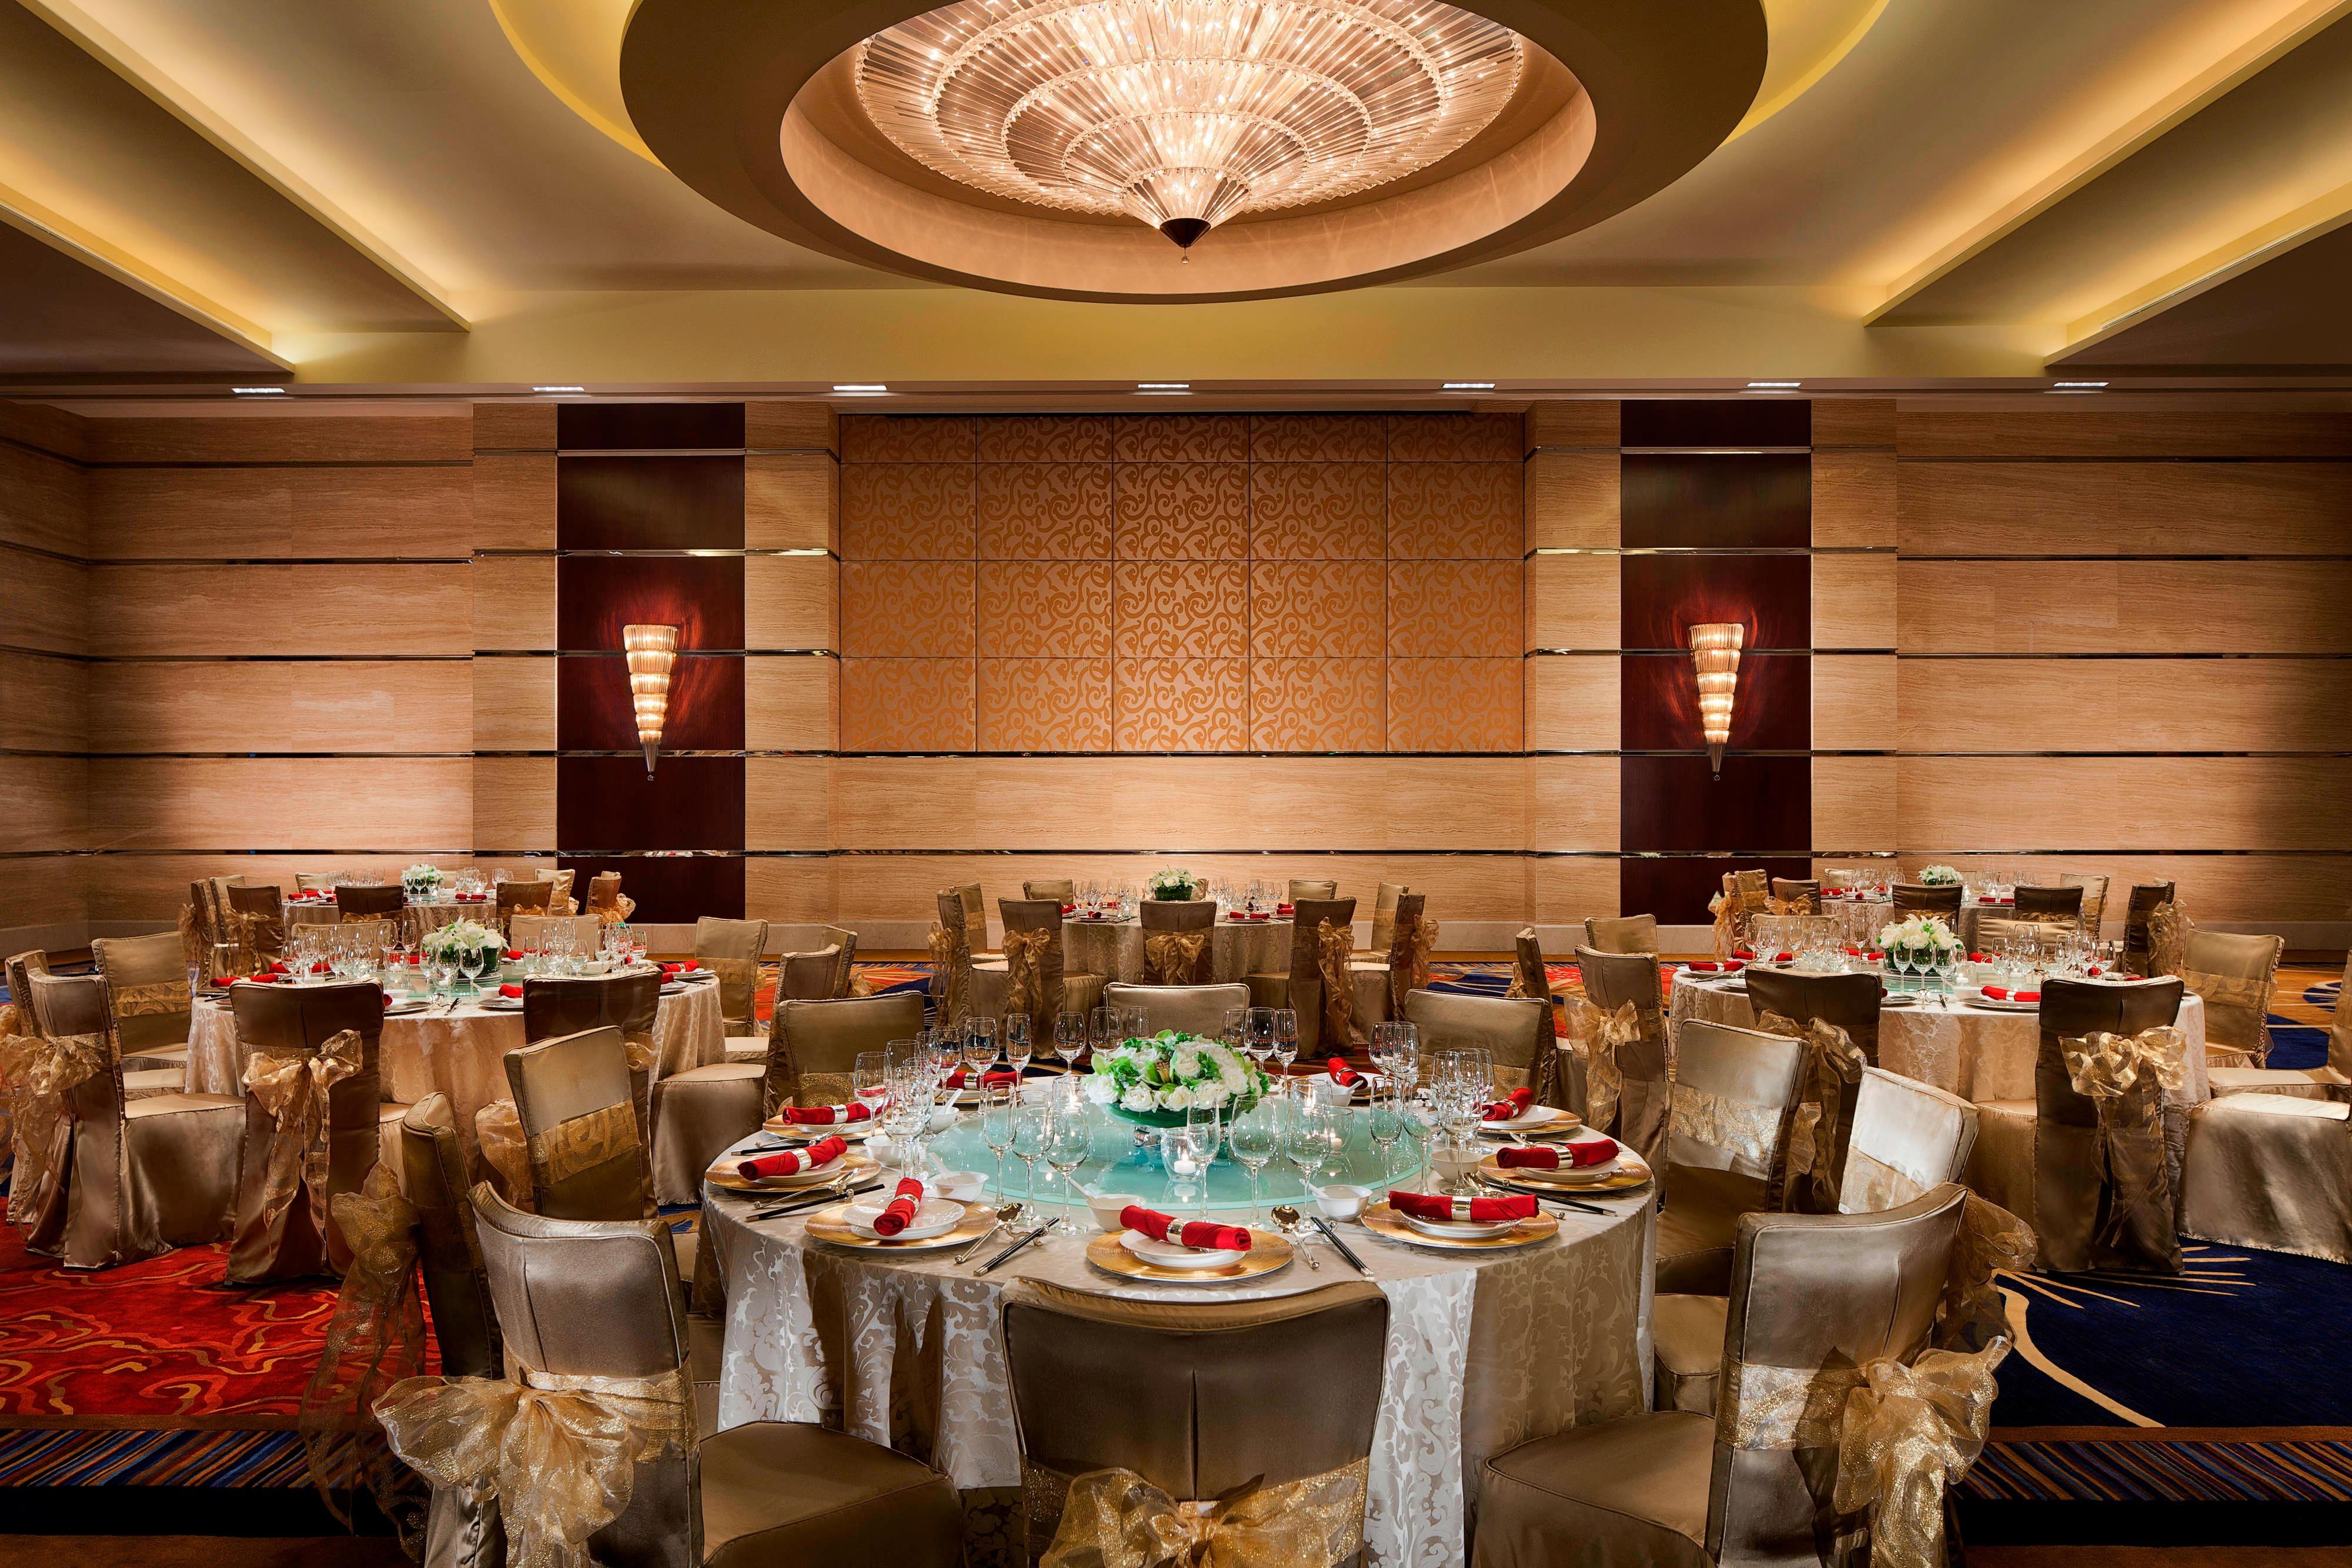 Chinese Wedding Banquet